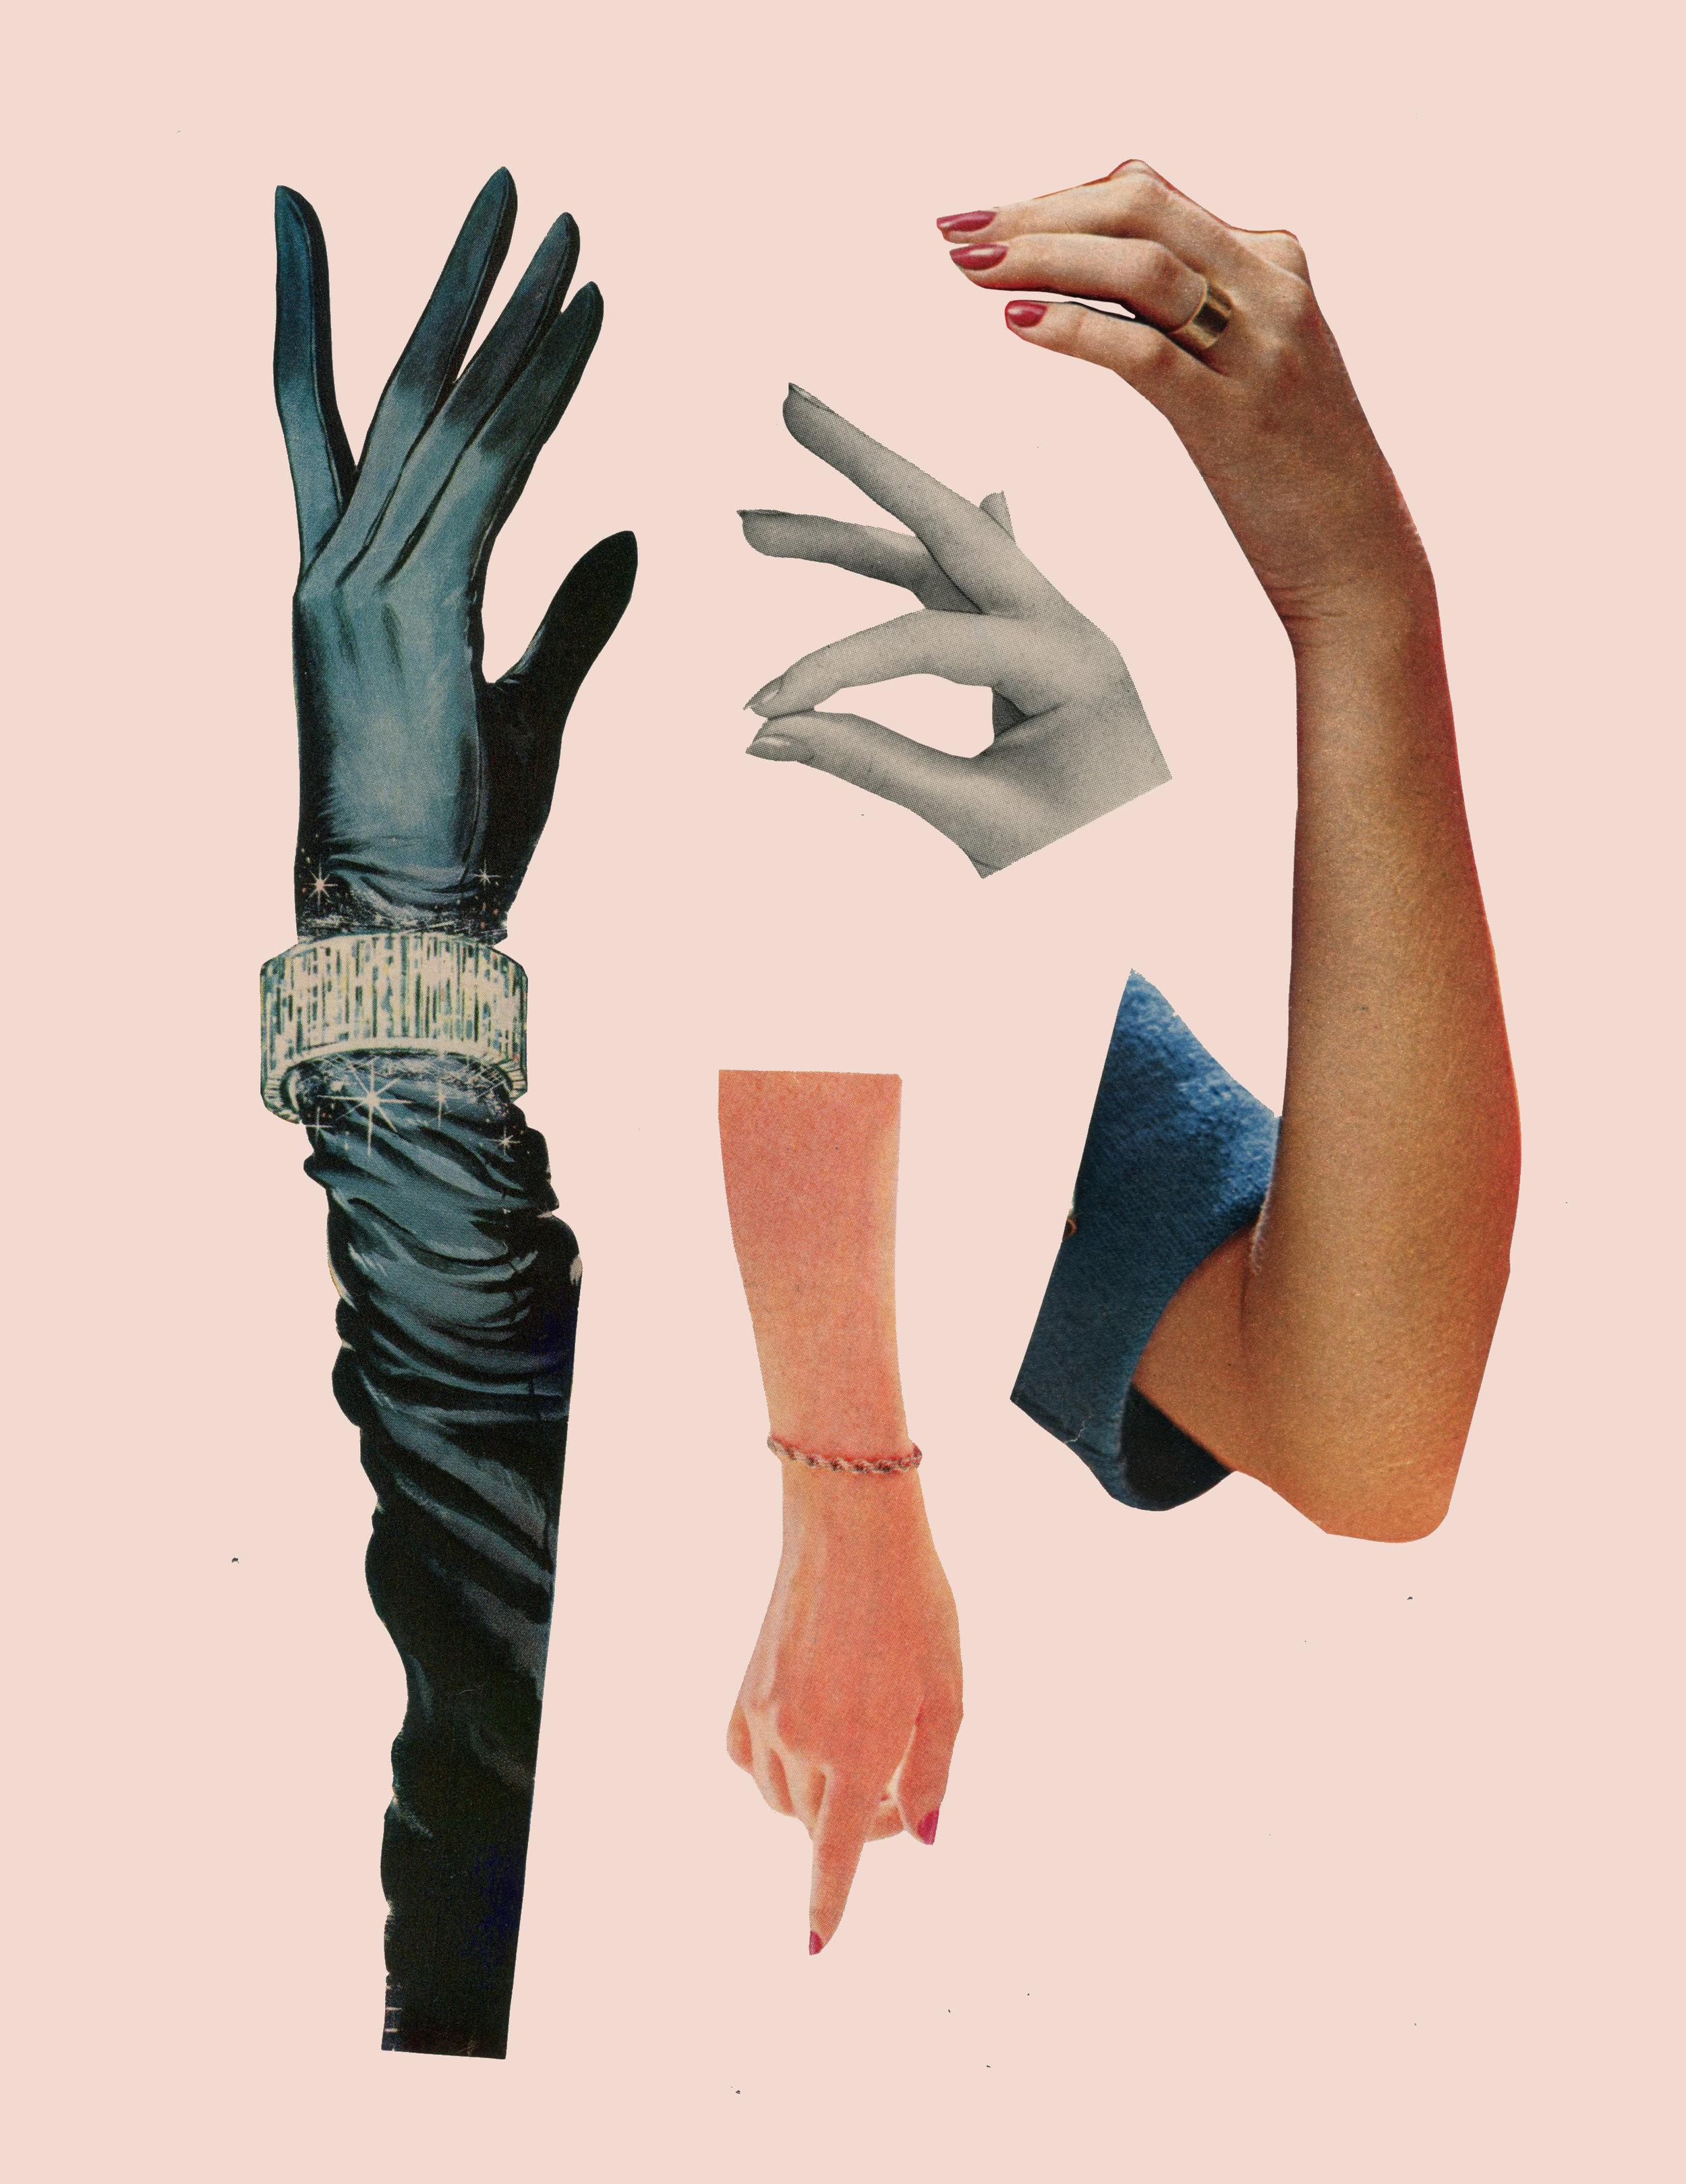 tenth degree002 hands pink--.jpg